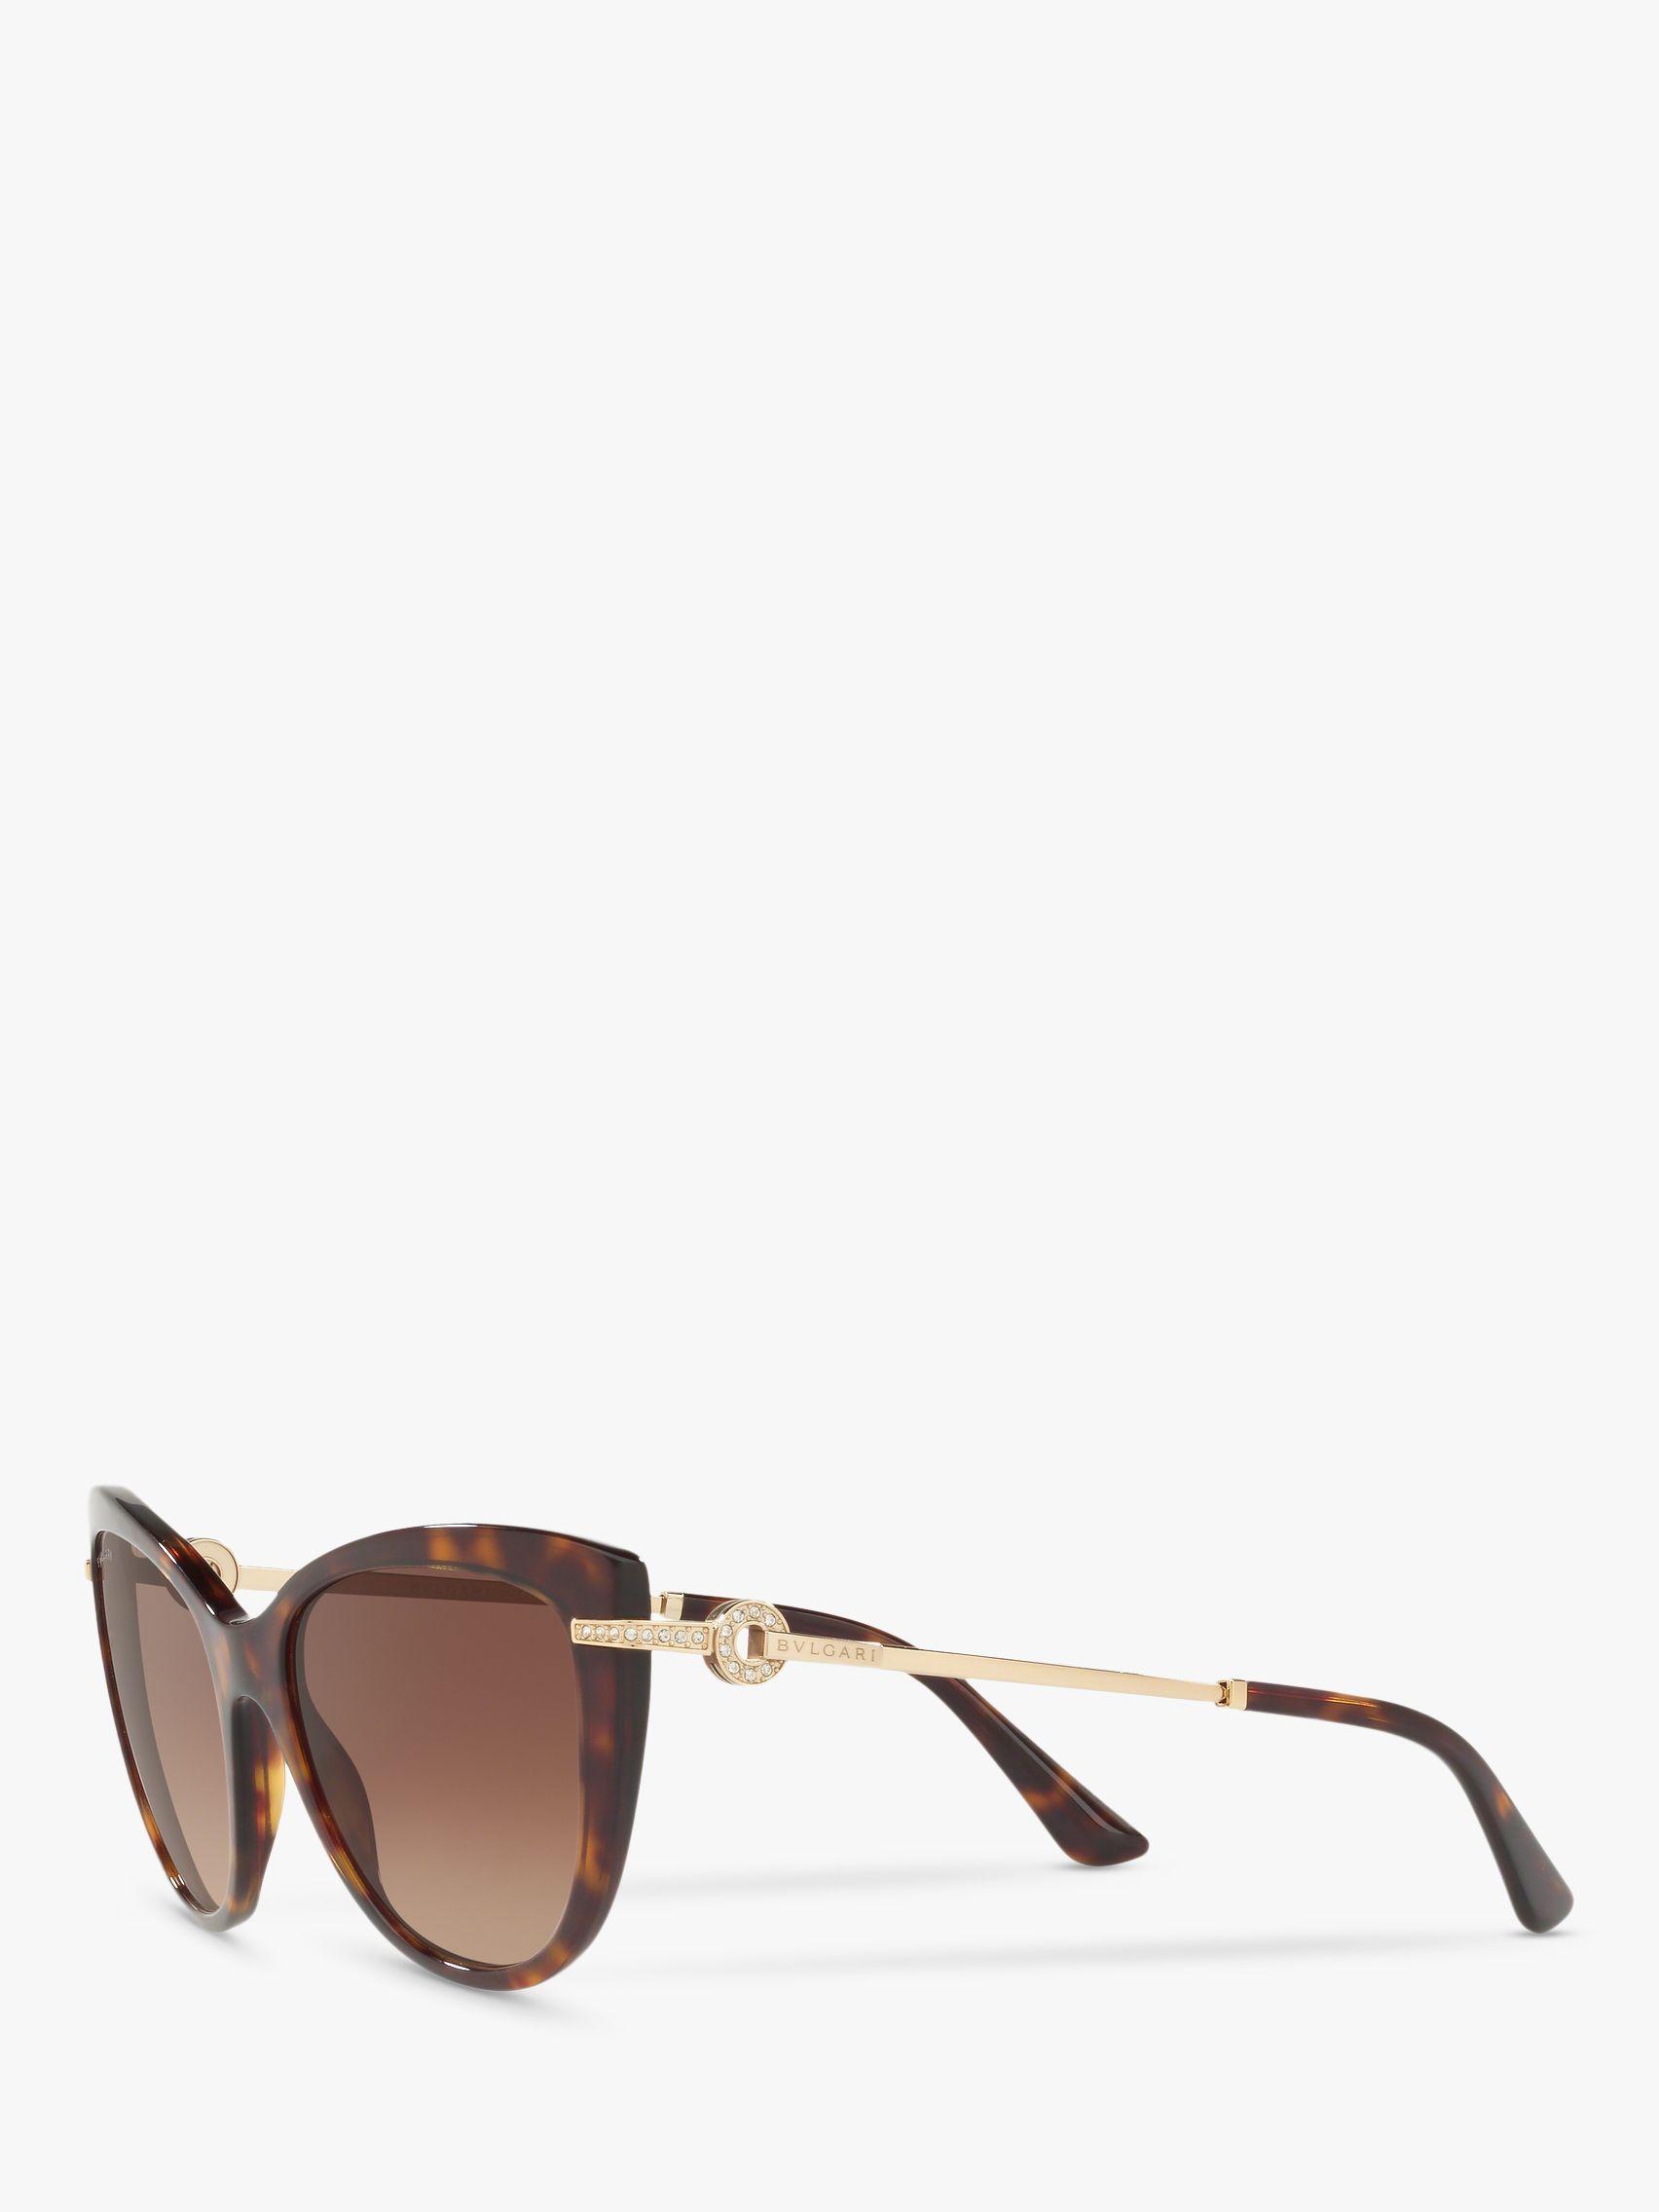 4f1a58dd43178 BVLGARI Bv8218b Women s Cat s Eye Sunglasses in Brown - Lyst